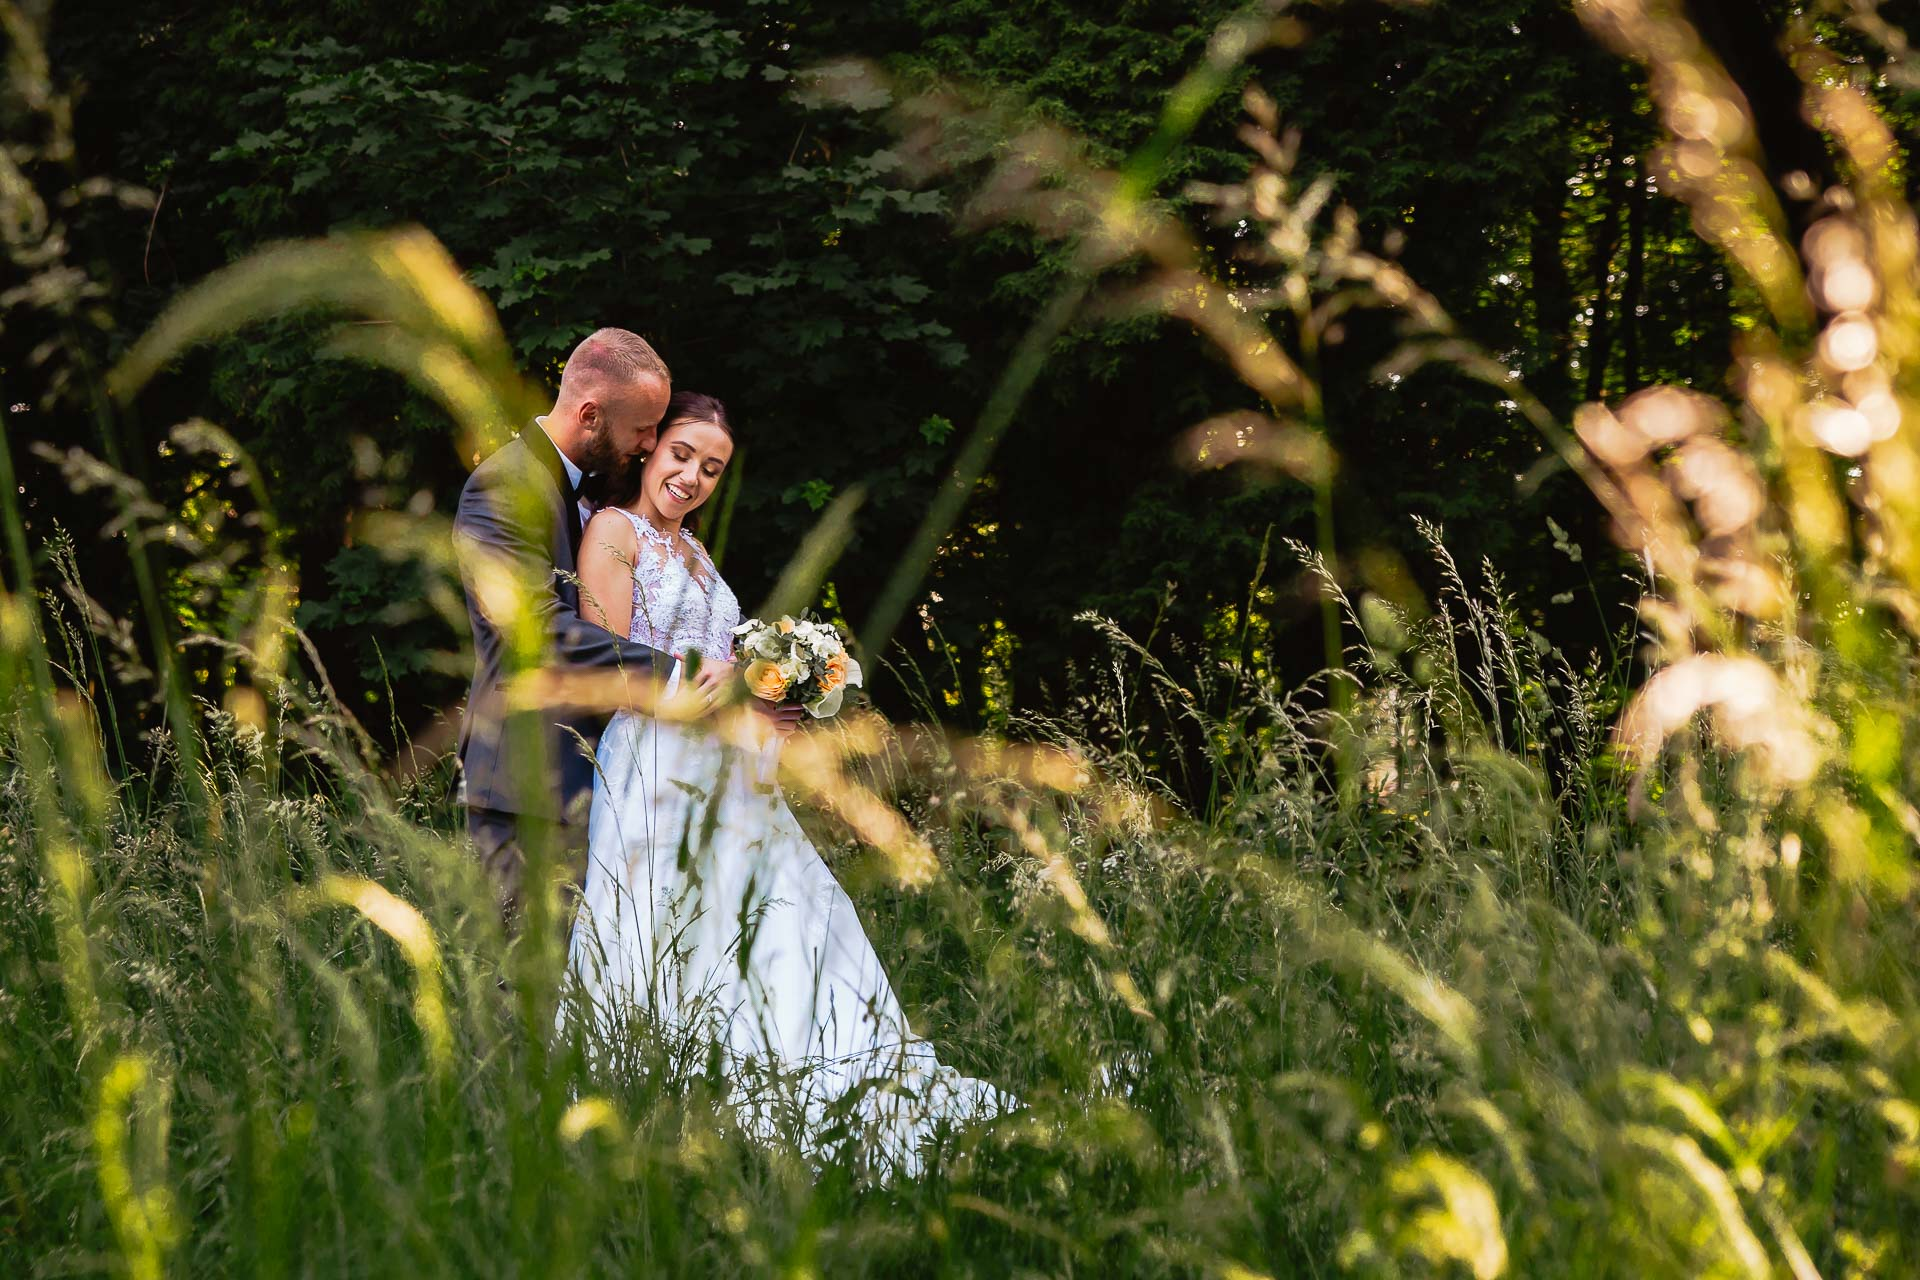 svatební-fotograf-svatebni-video-Nymburk-hotel-Ostrov-Beautyfoto-6314